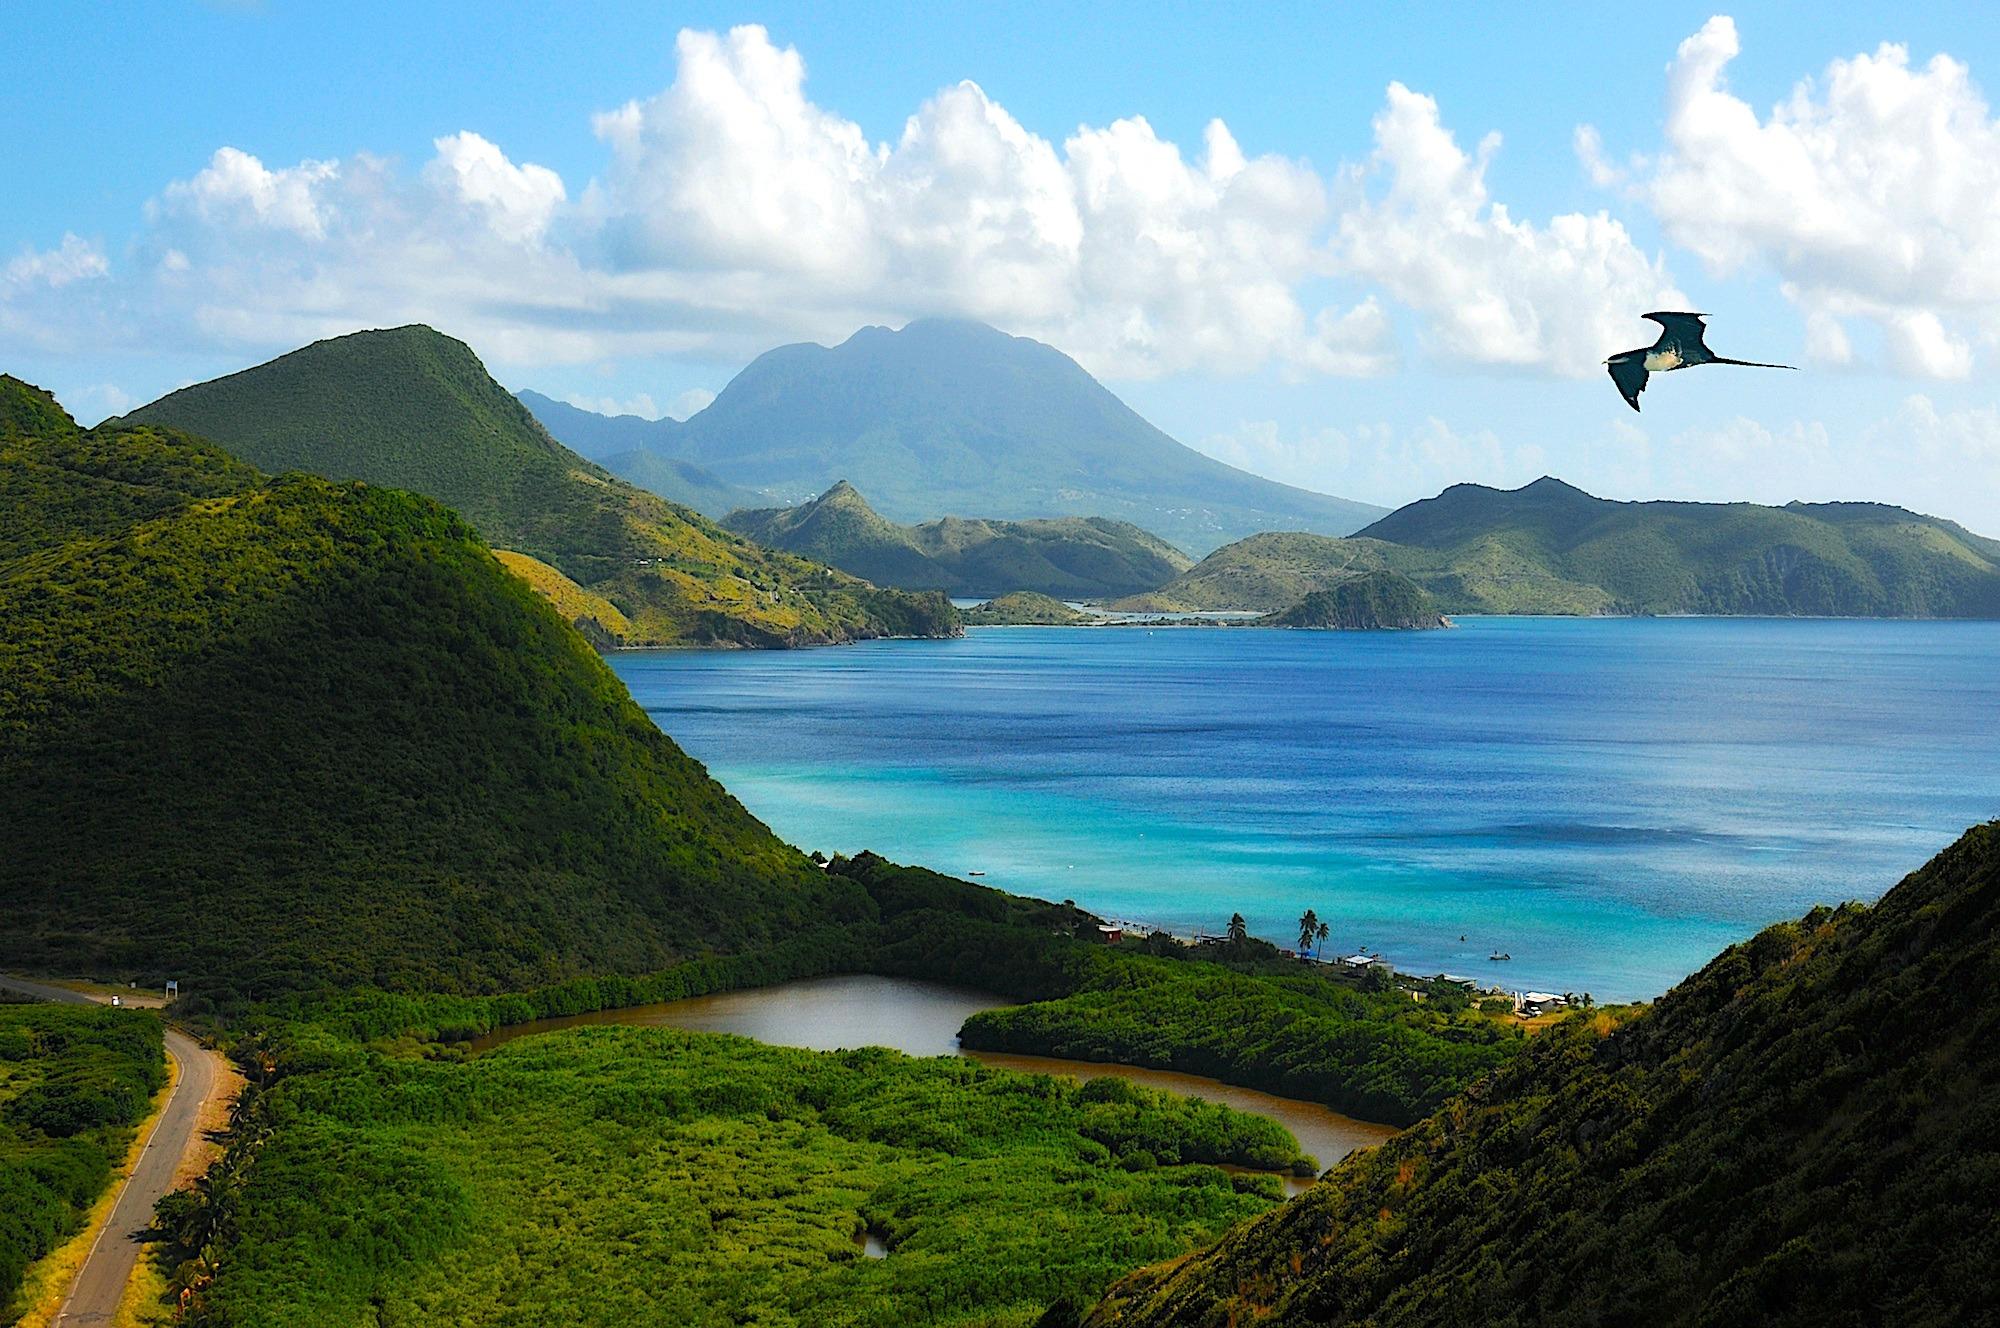 St. Kitts Scenery